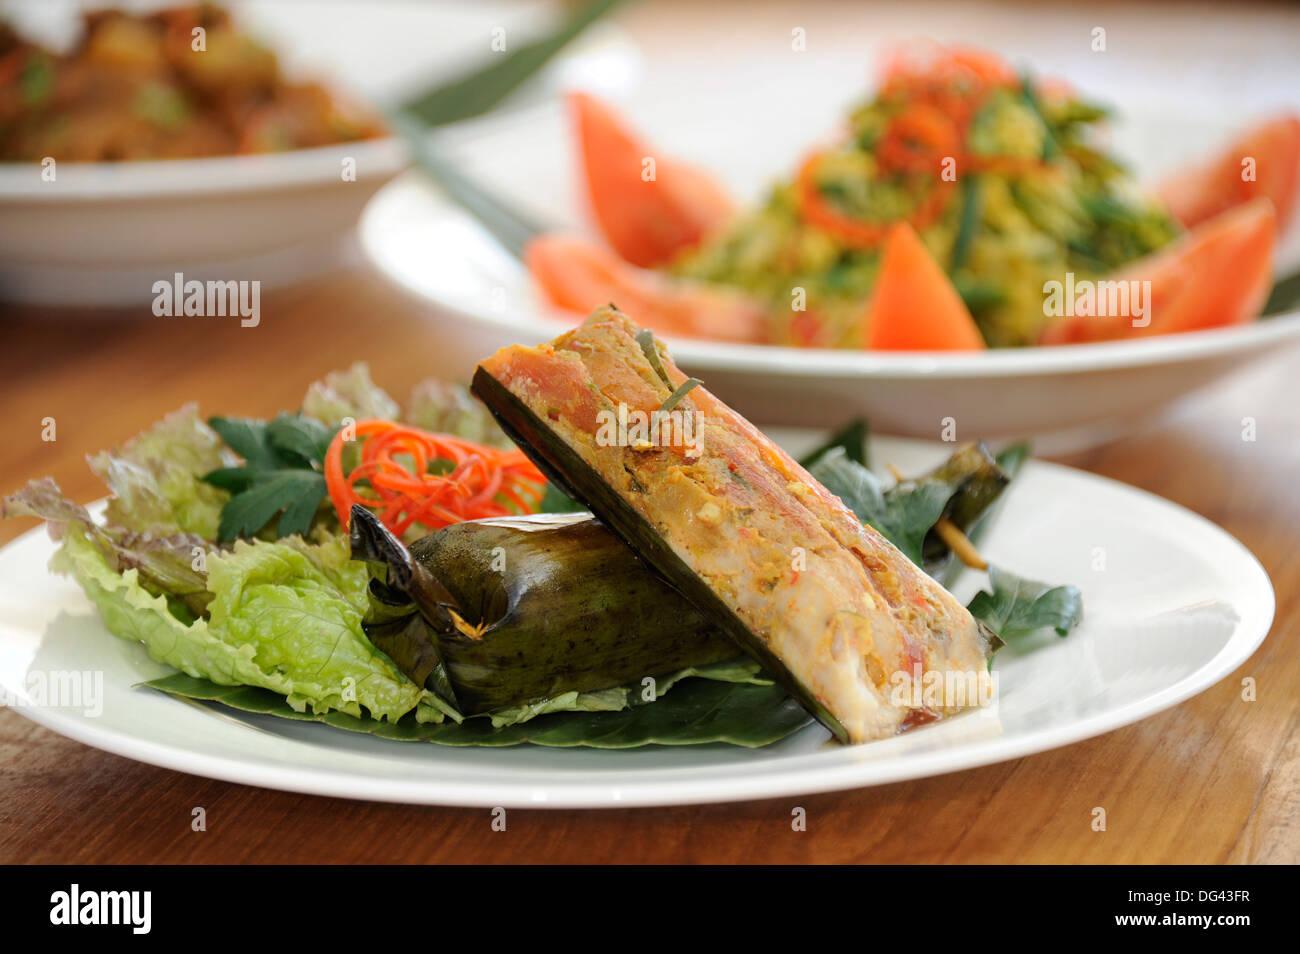 Balinese Food Stock Photos Balinese Food Stock Images Alamy